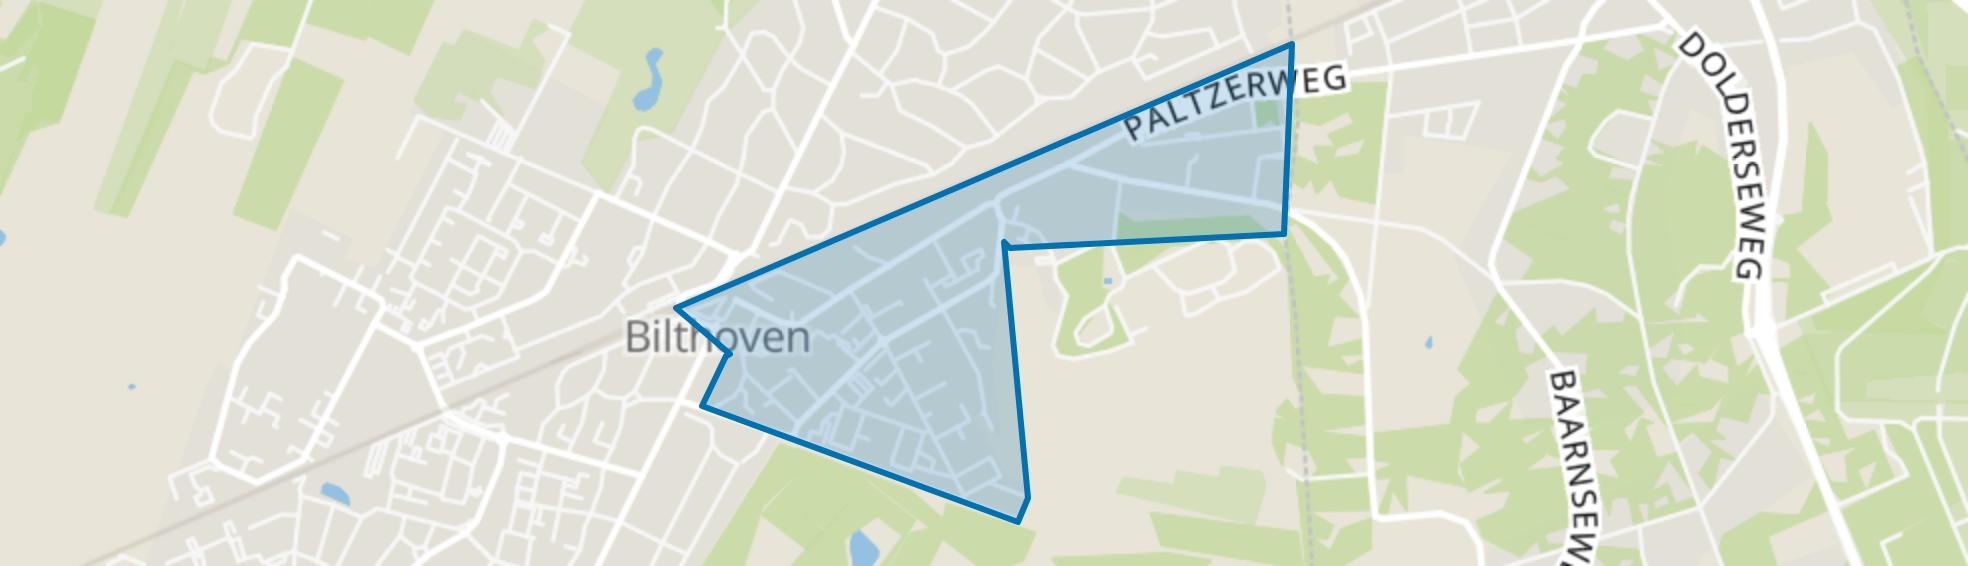 Bilthoven Centrum, Bilthoven map